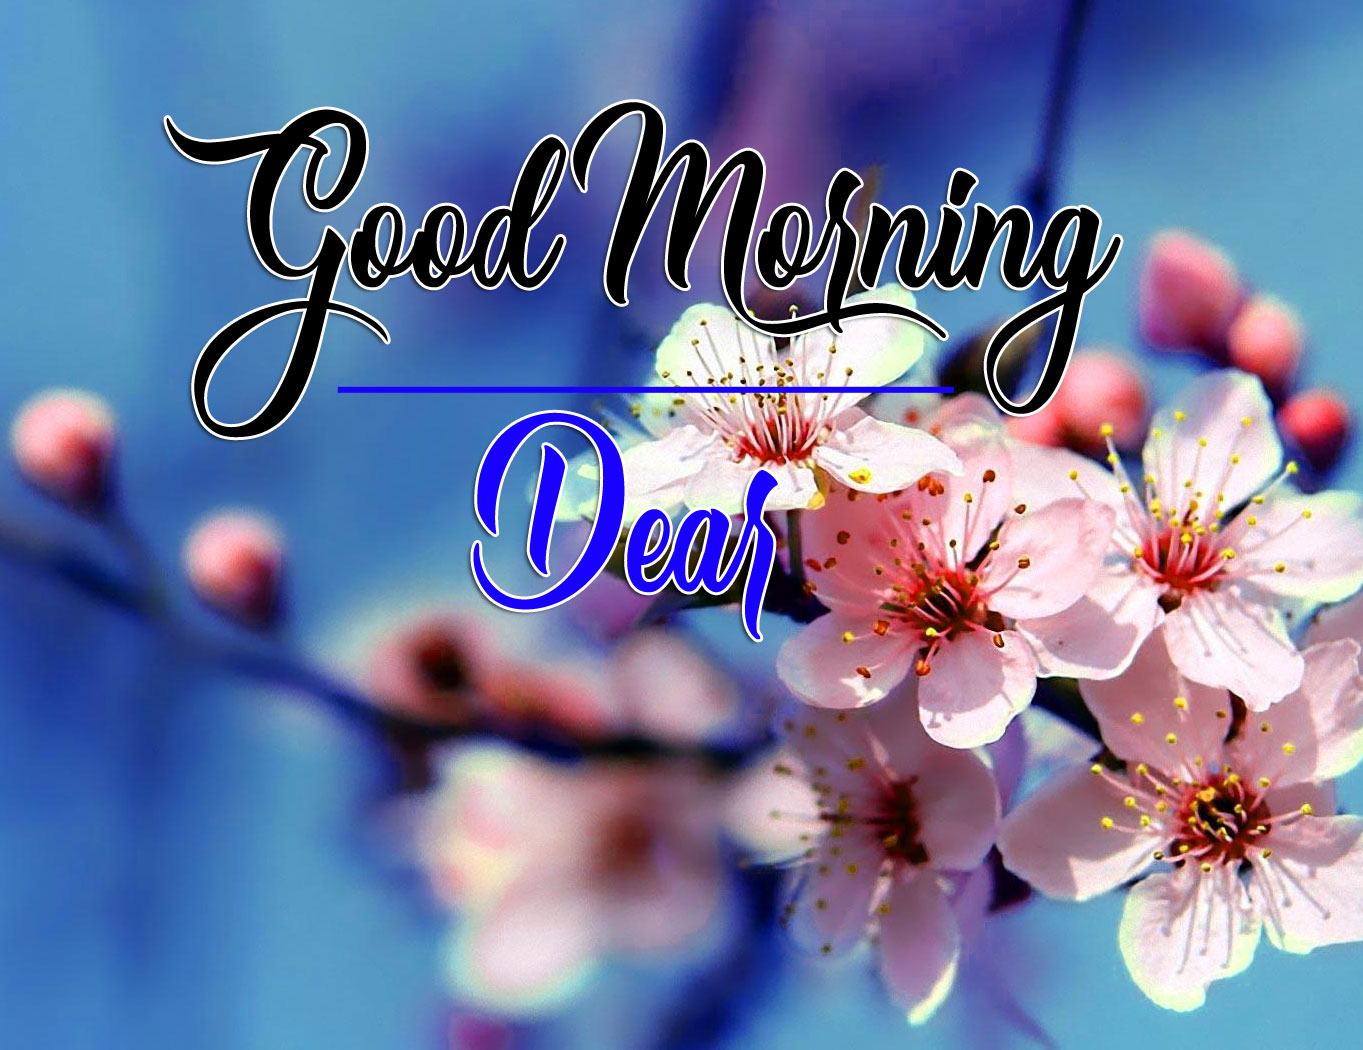 Good Morning Images Free Pics